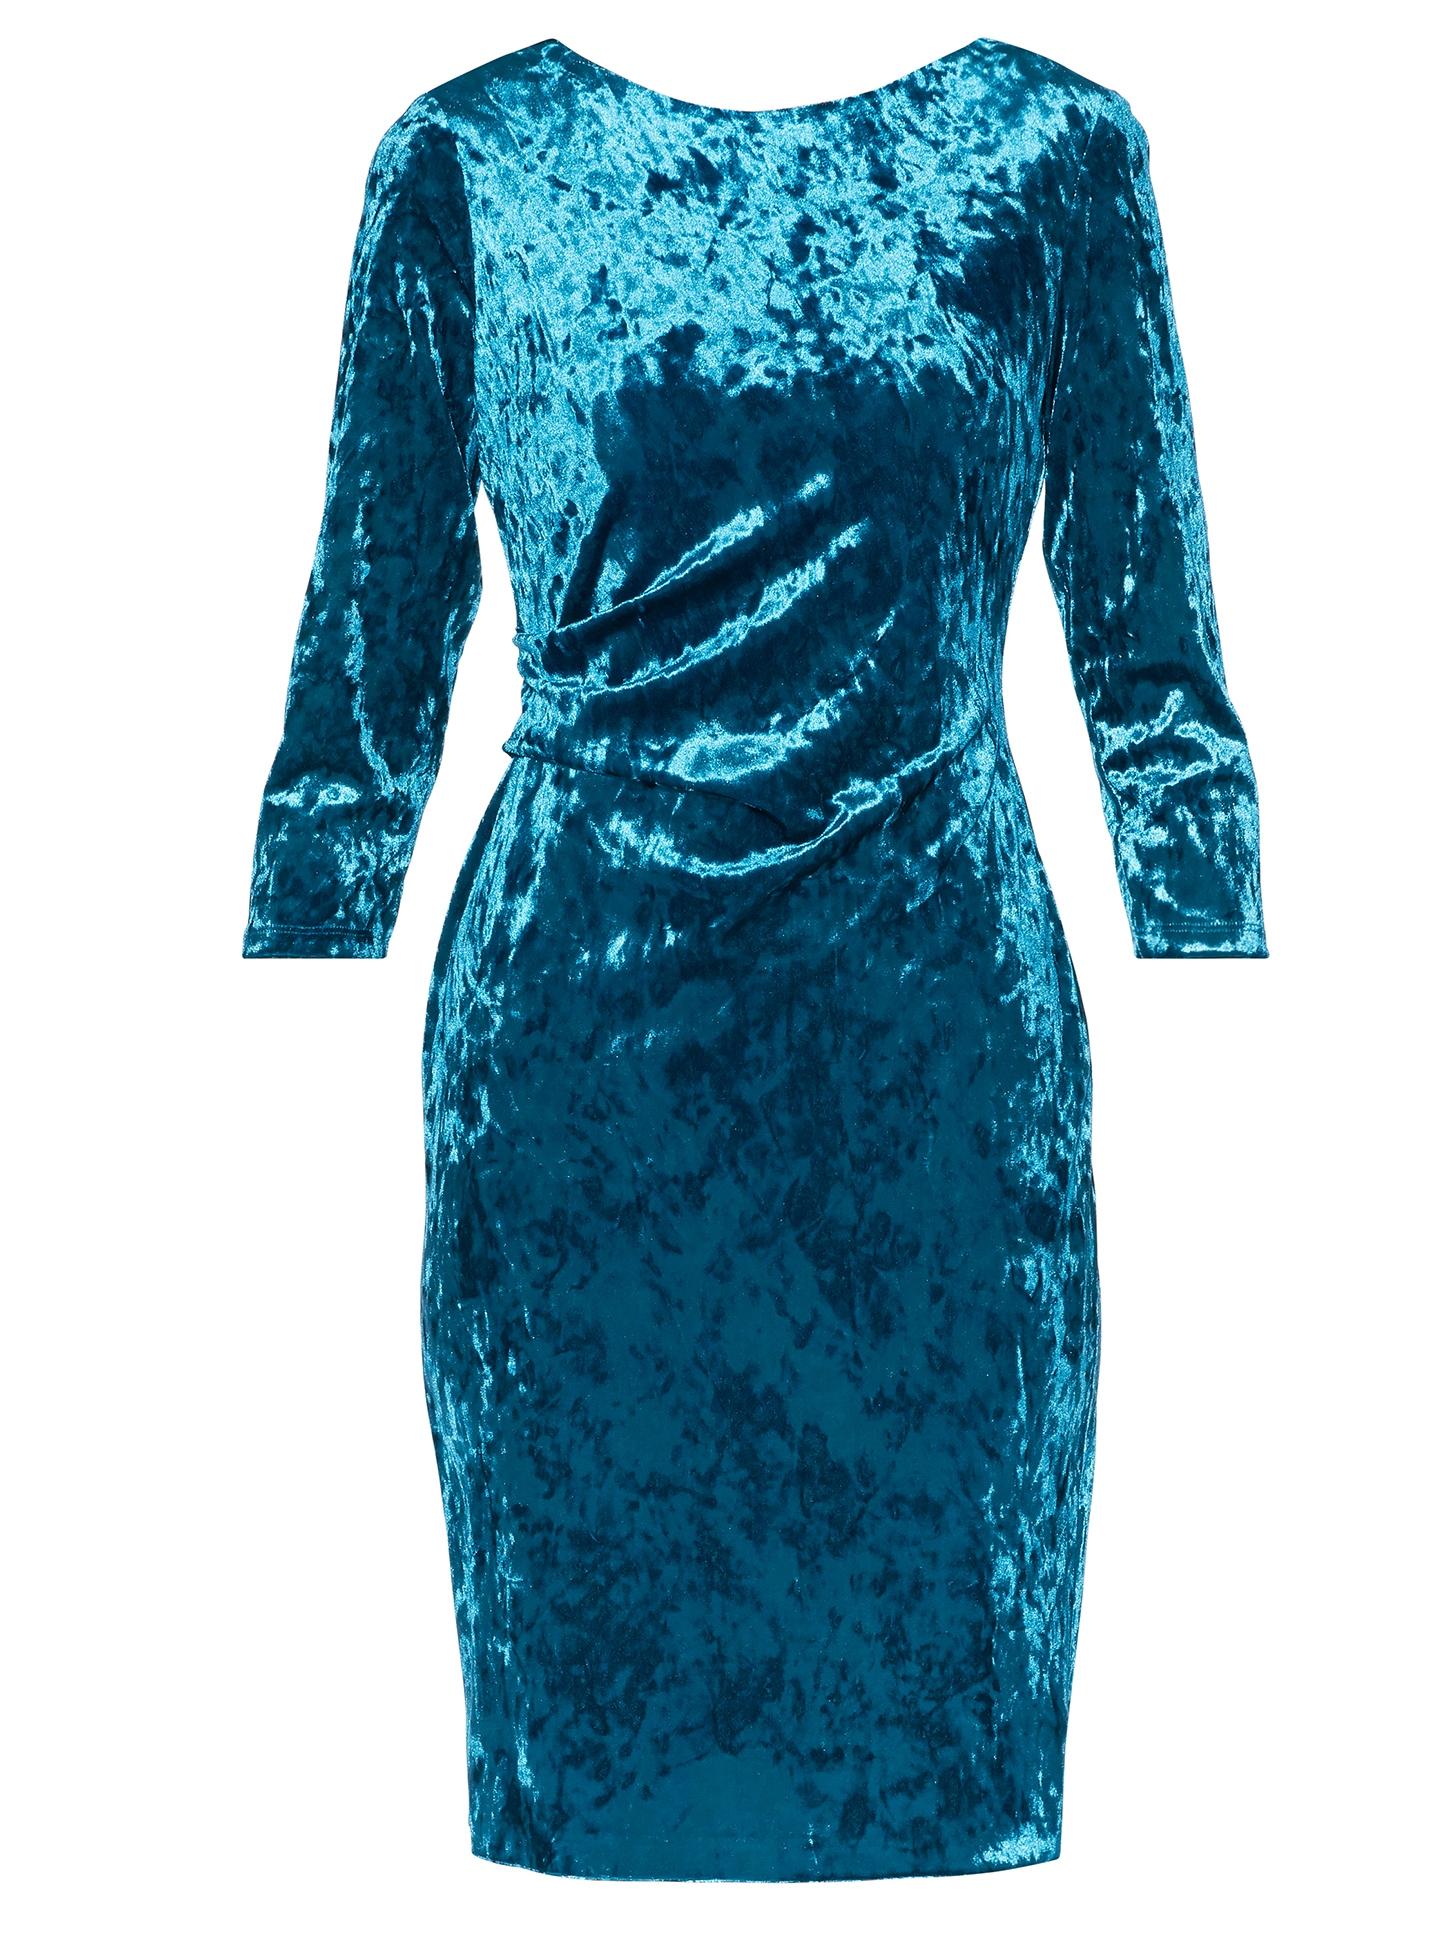 Bellatrix Crushed Velvet Dress